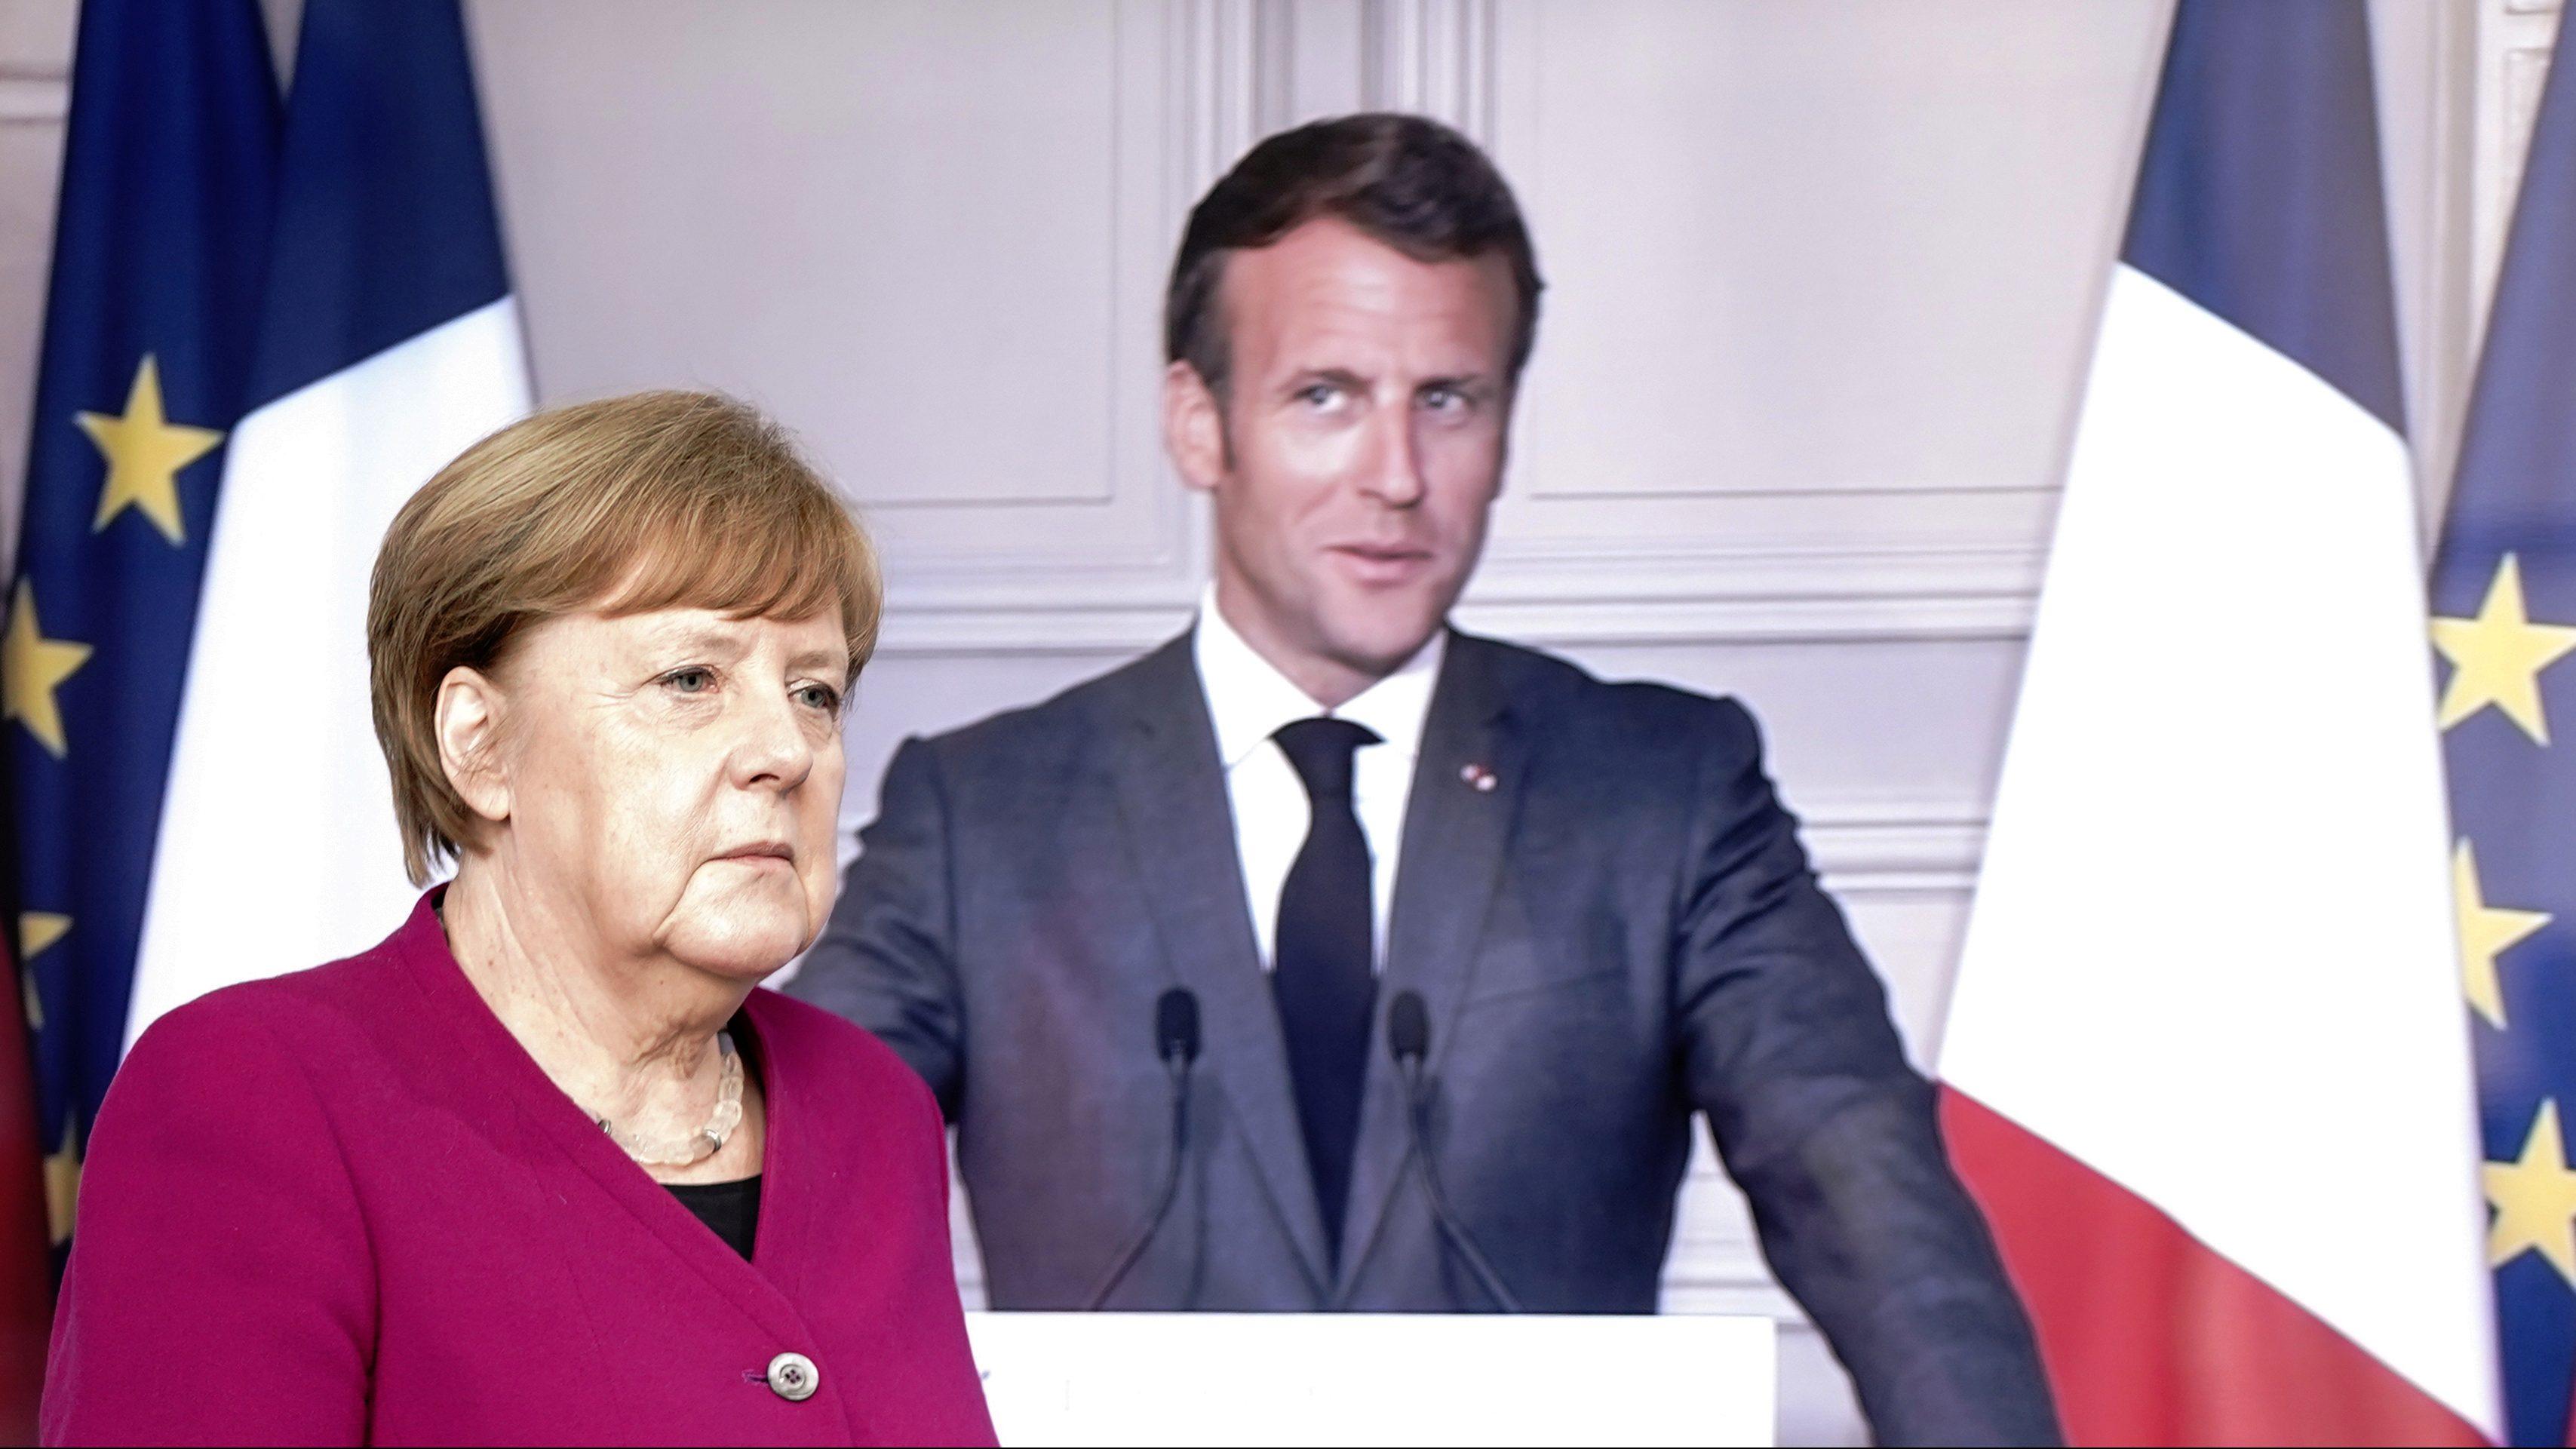 Angela Merkel walks by a television screen featuring Emmanuel Macron.